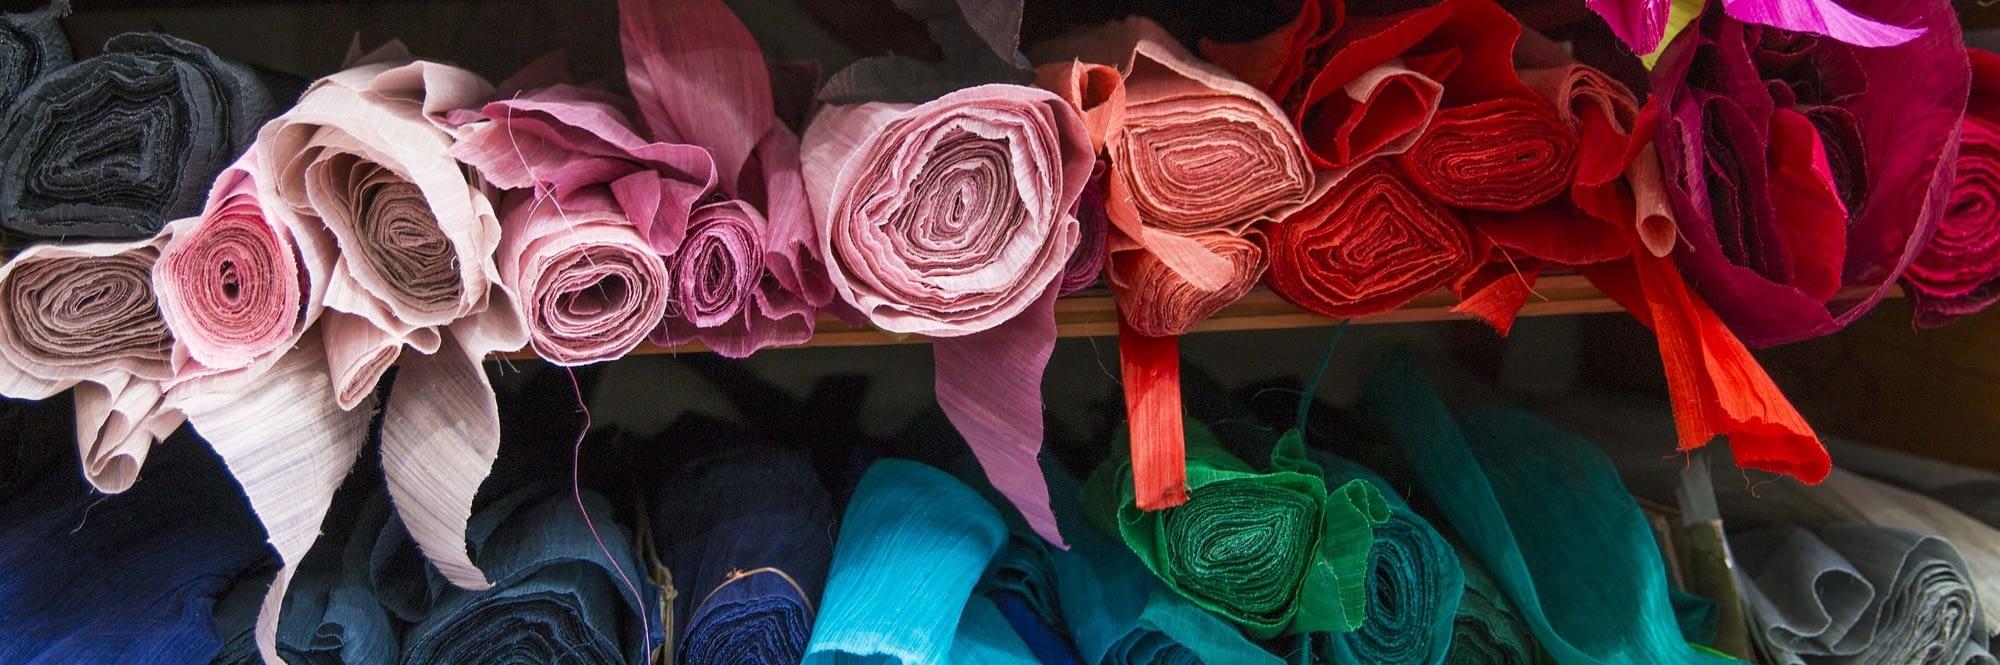 Craft & Millinery Supplies -- fabrics